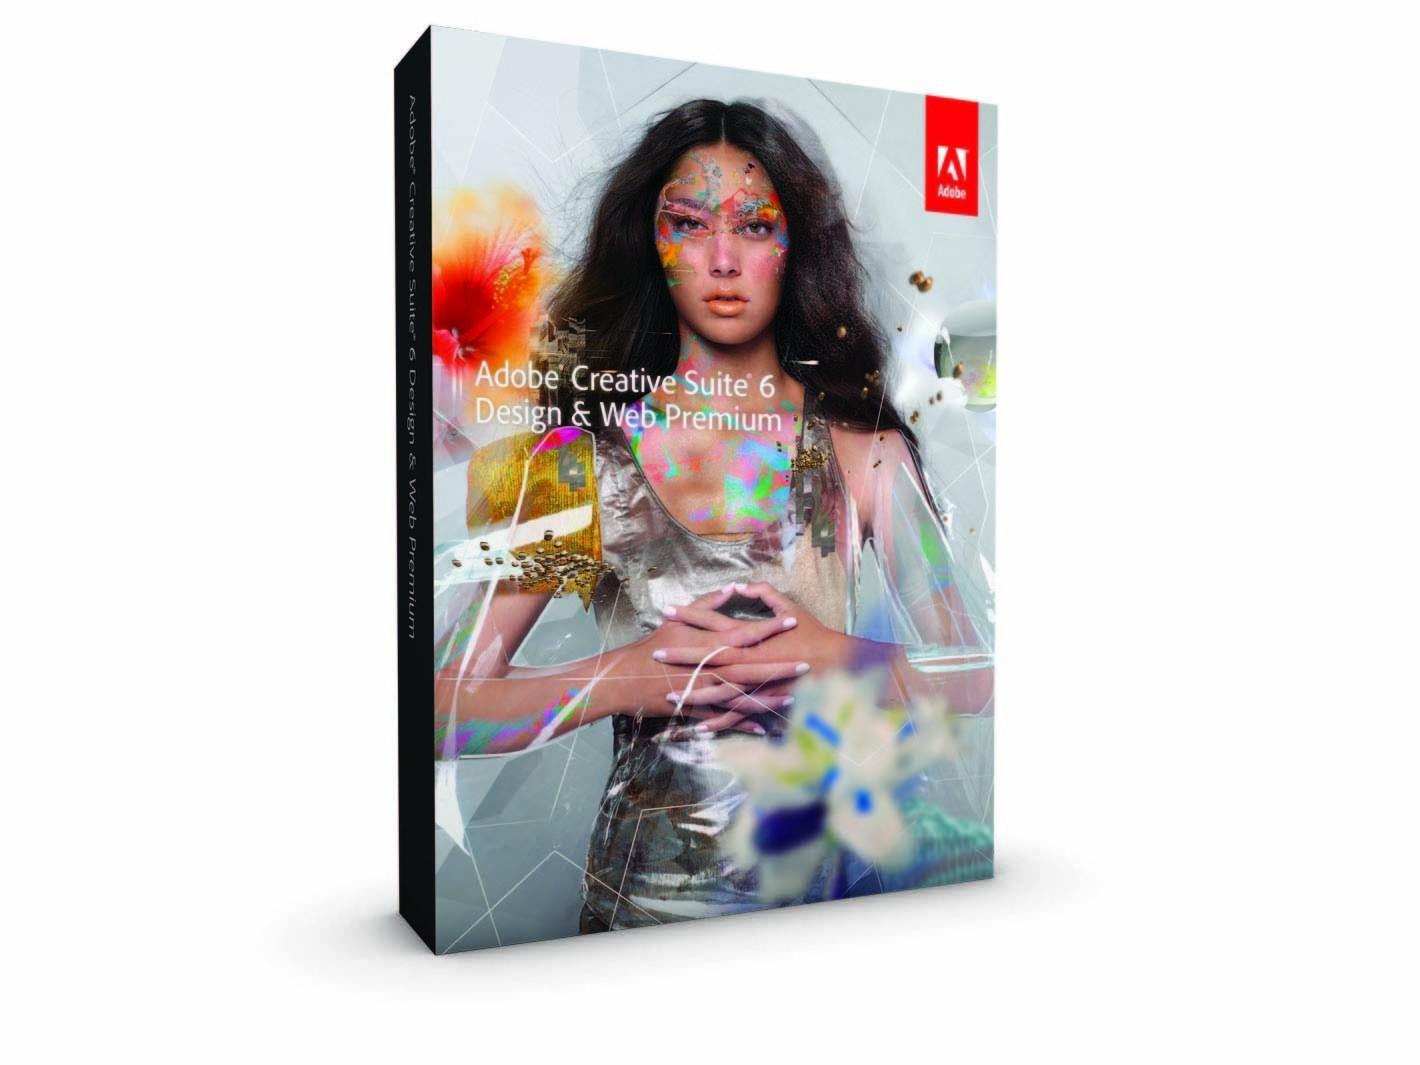 Adobe CS6 Design and Web Prem